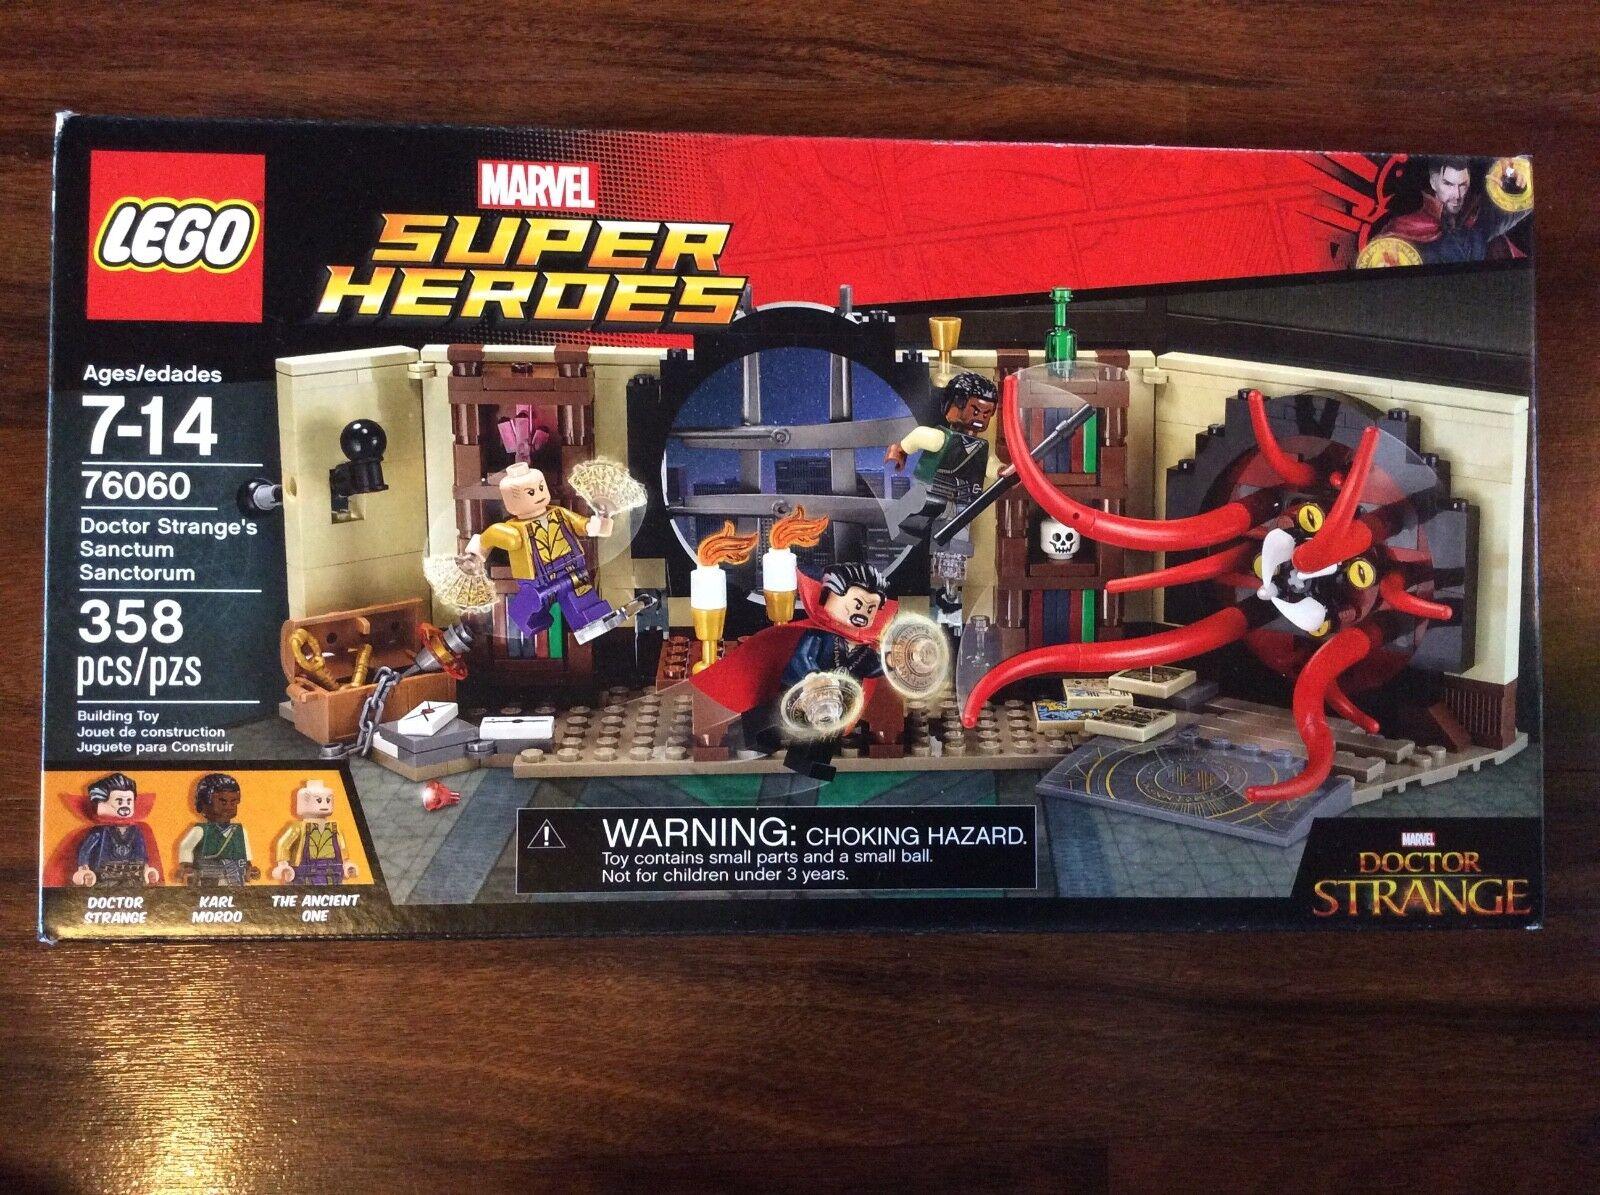 New Lego Super Heroes Doctor Strange's Sanctum Sanctorum Set 76060 Damaged Box